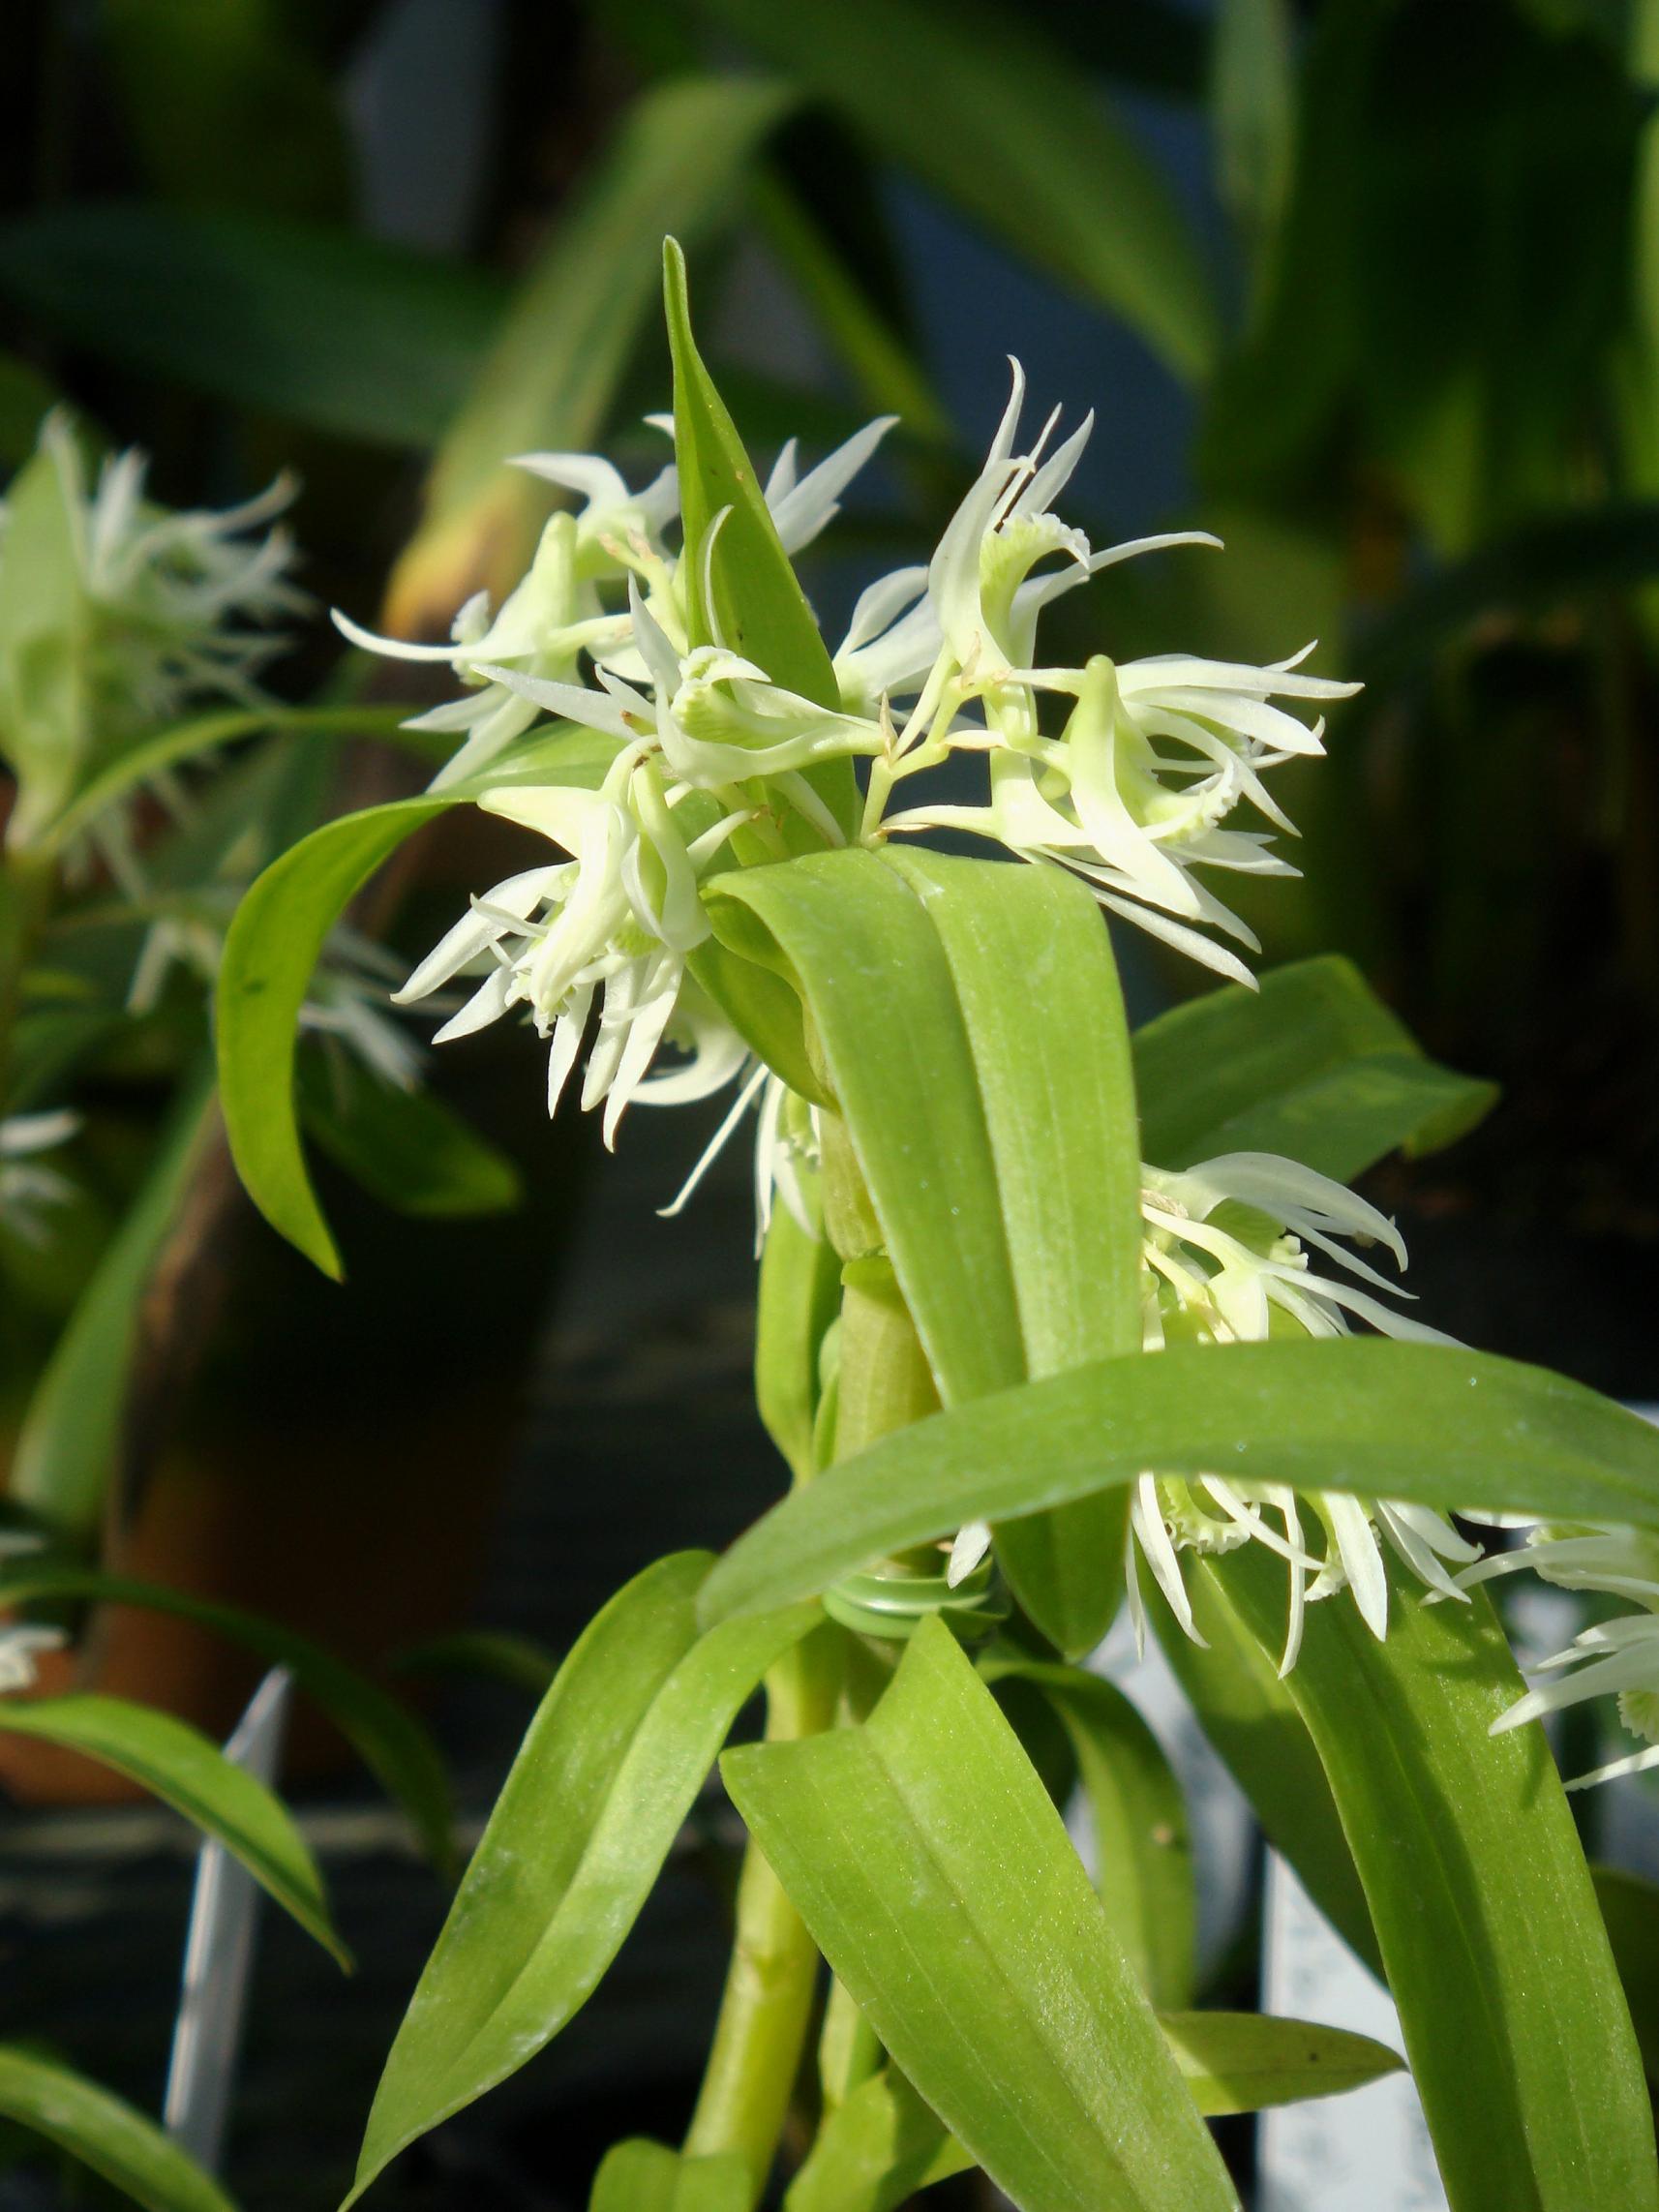 http://orchids.la.coocan.jp/Dendrobium/Dendrobium%20kratense/DSC05437.JPG